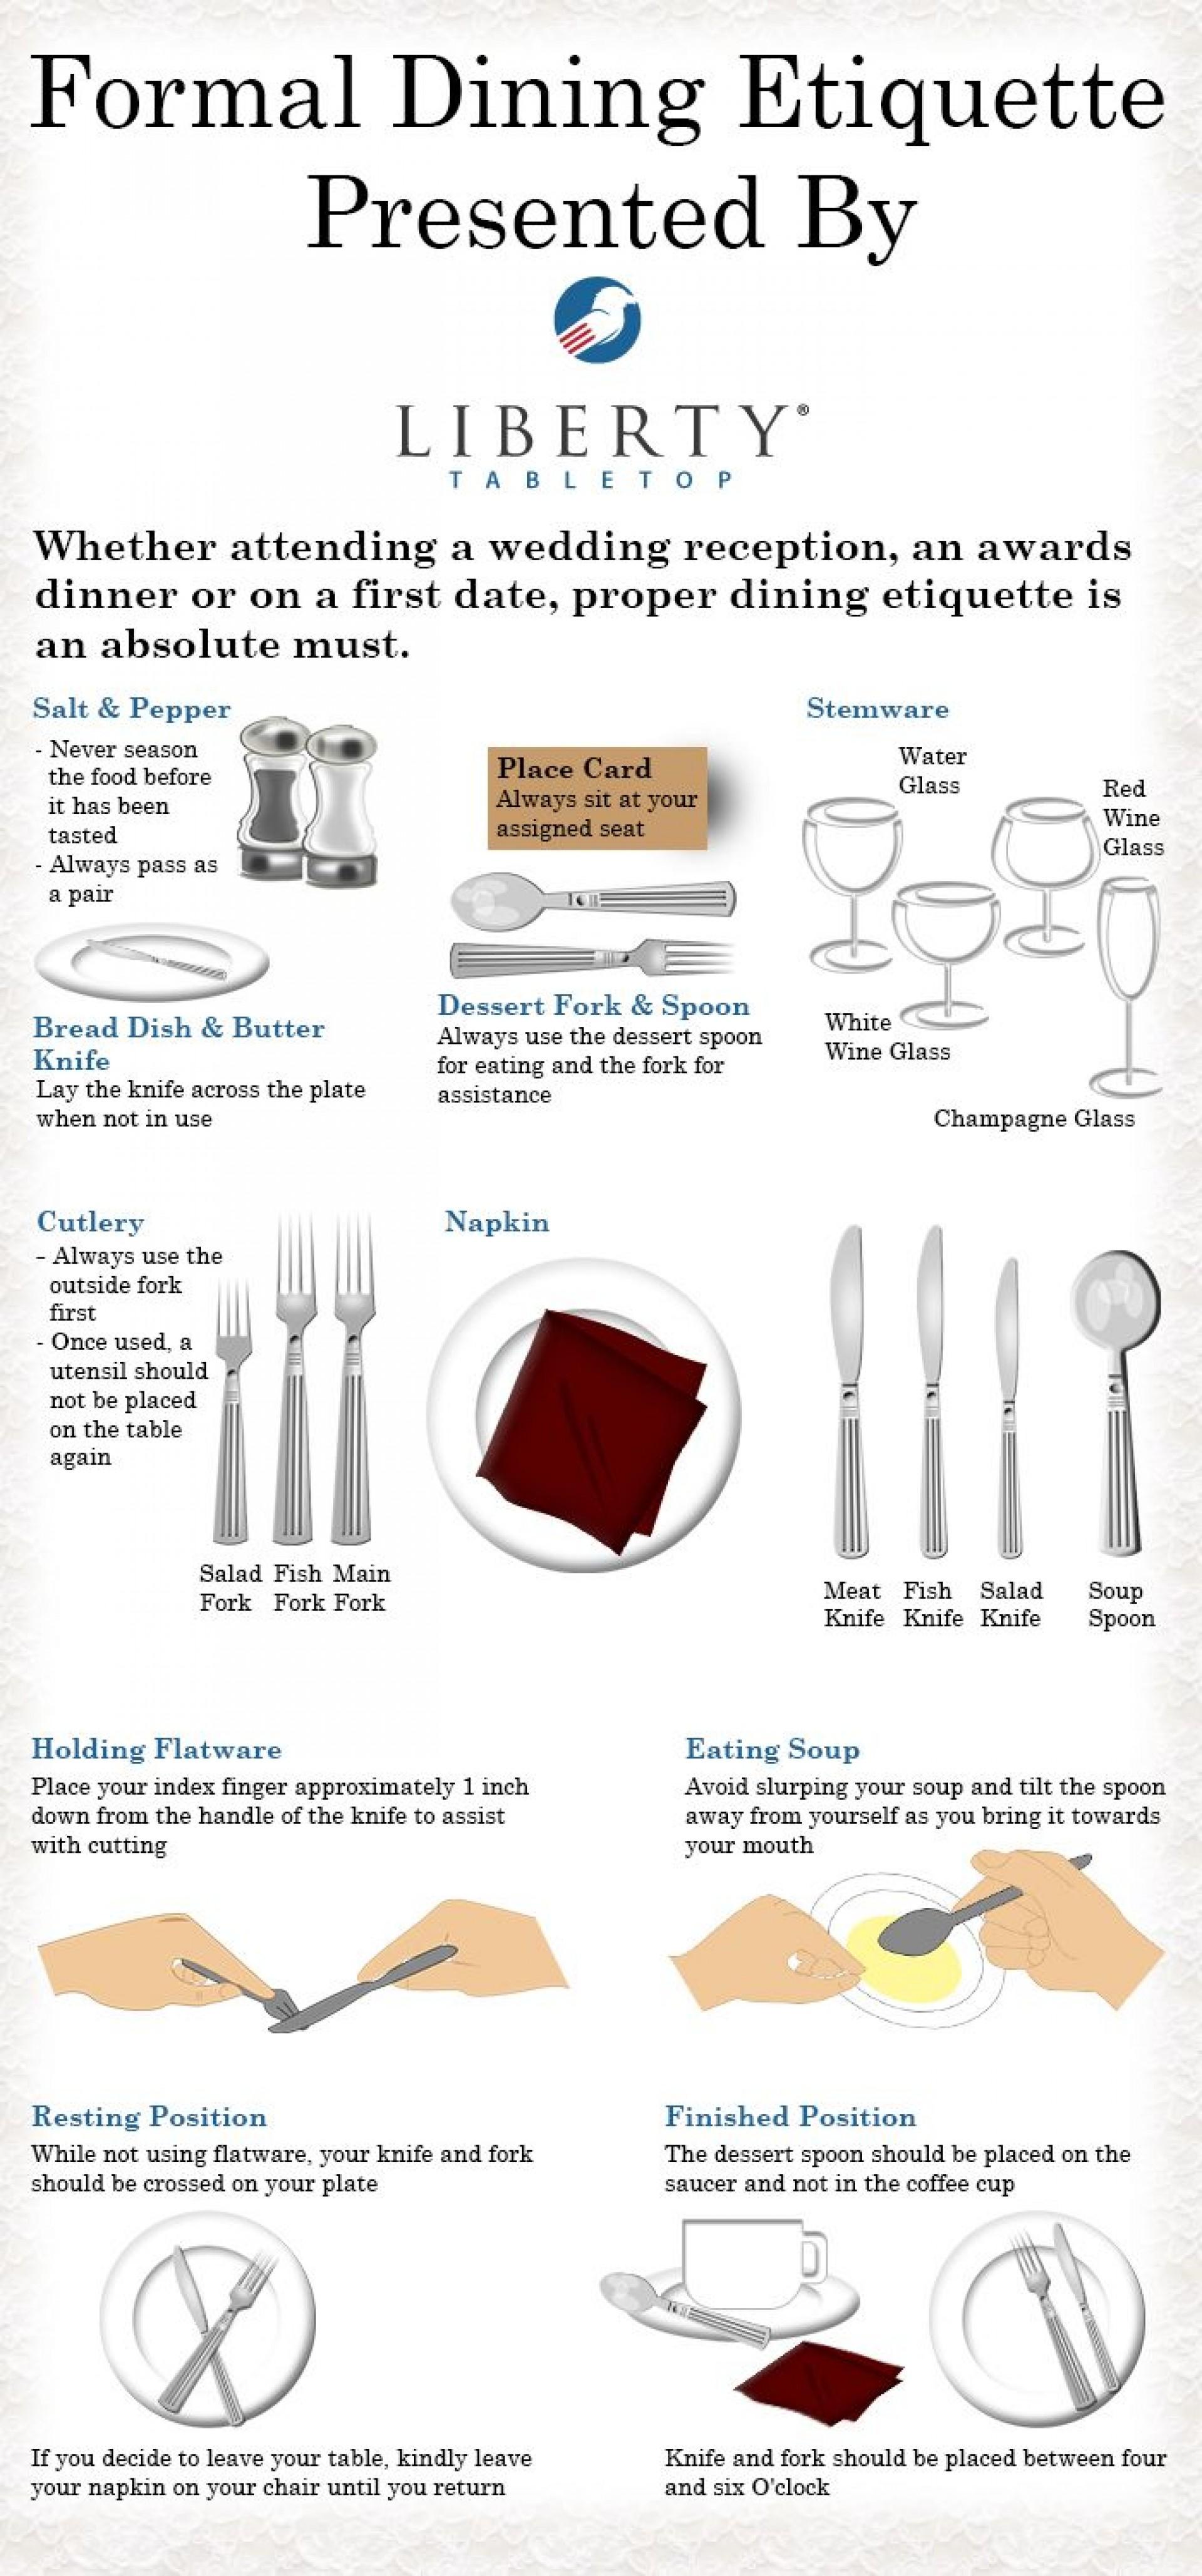 010 Basic Table Manners Essay Wonderful 1920